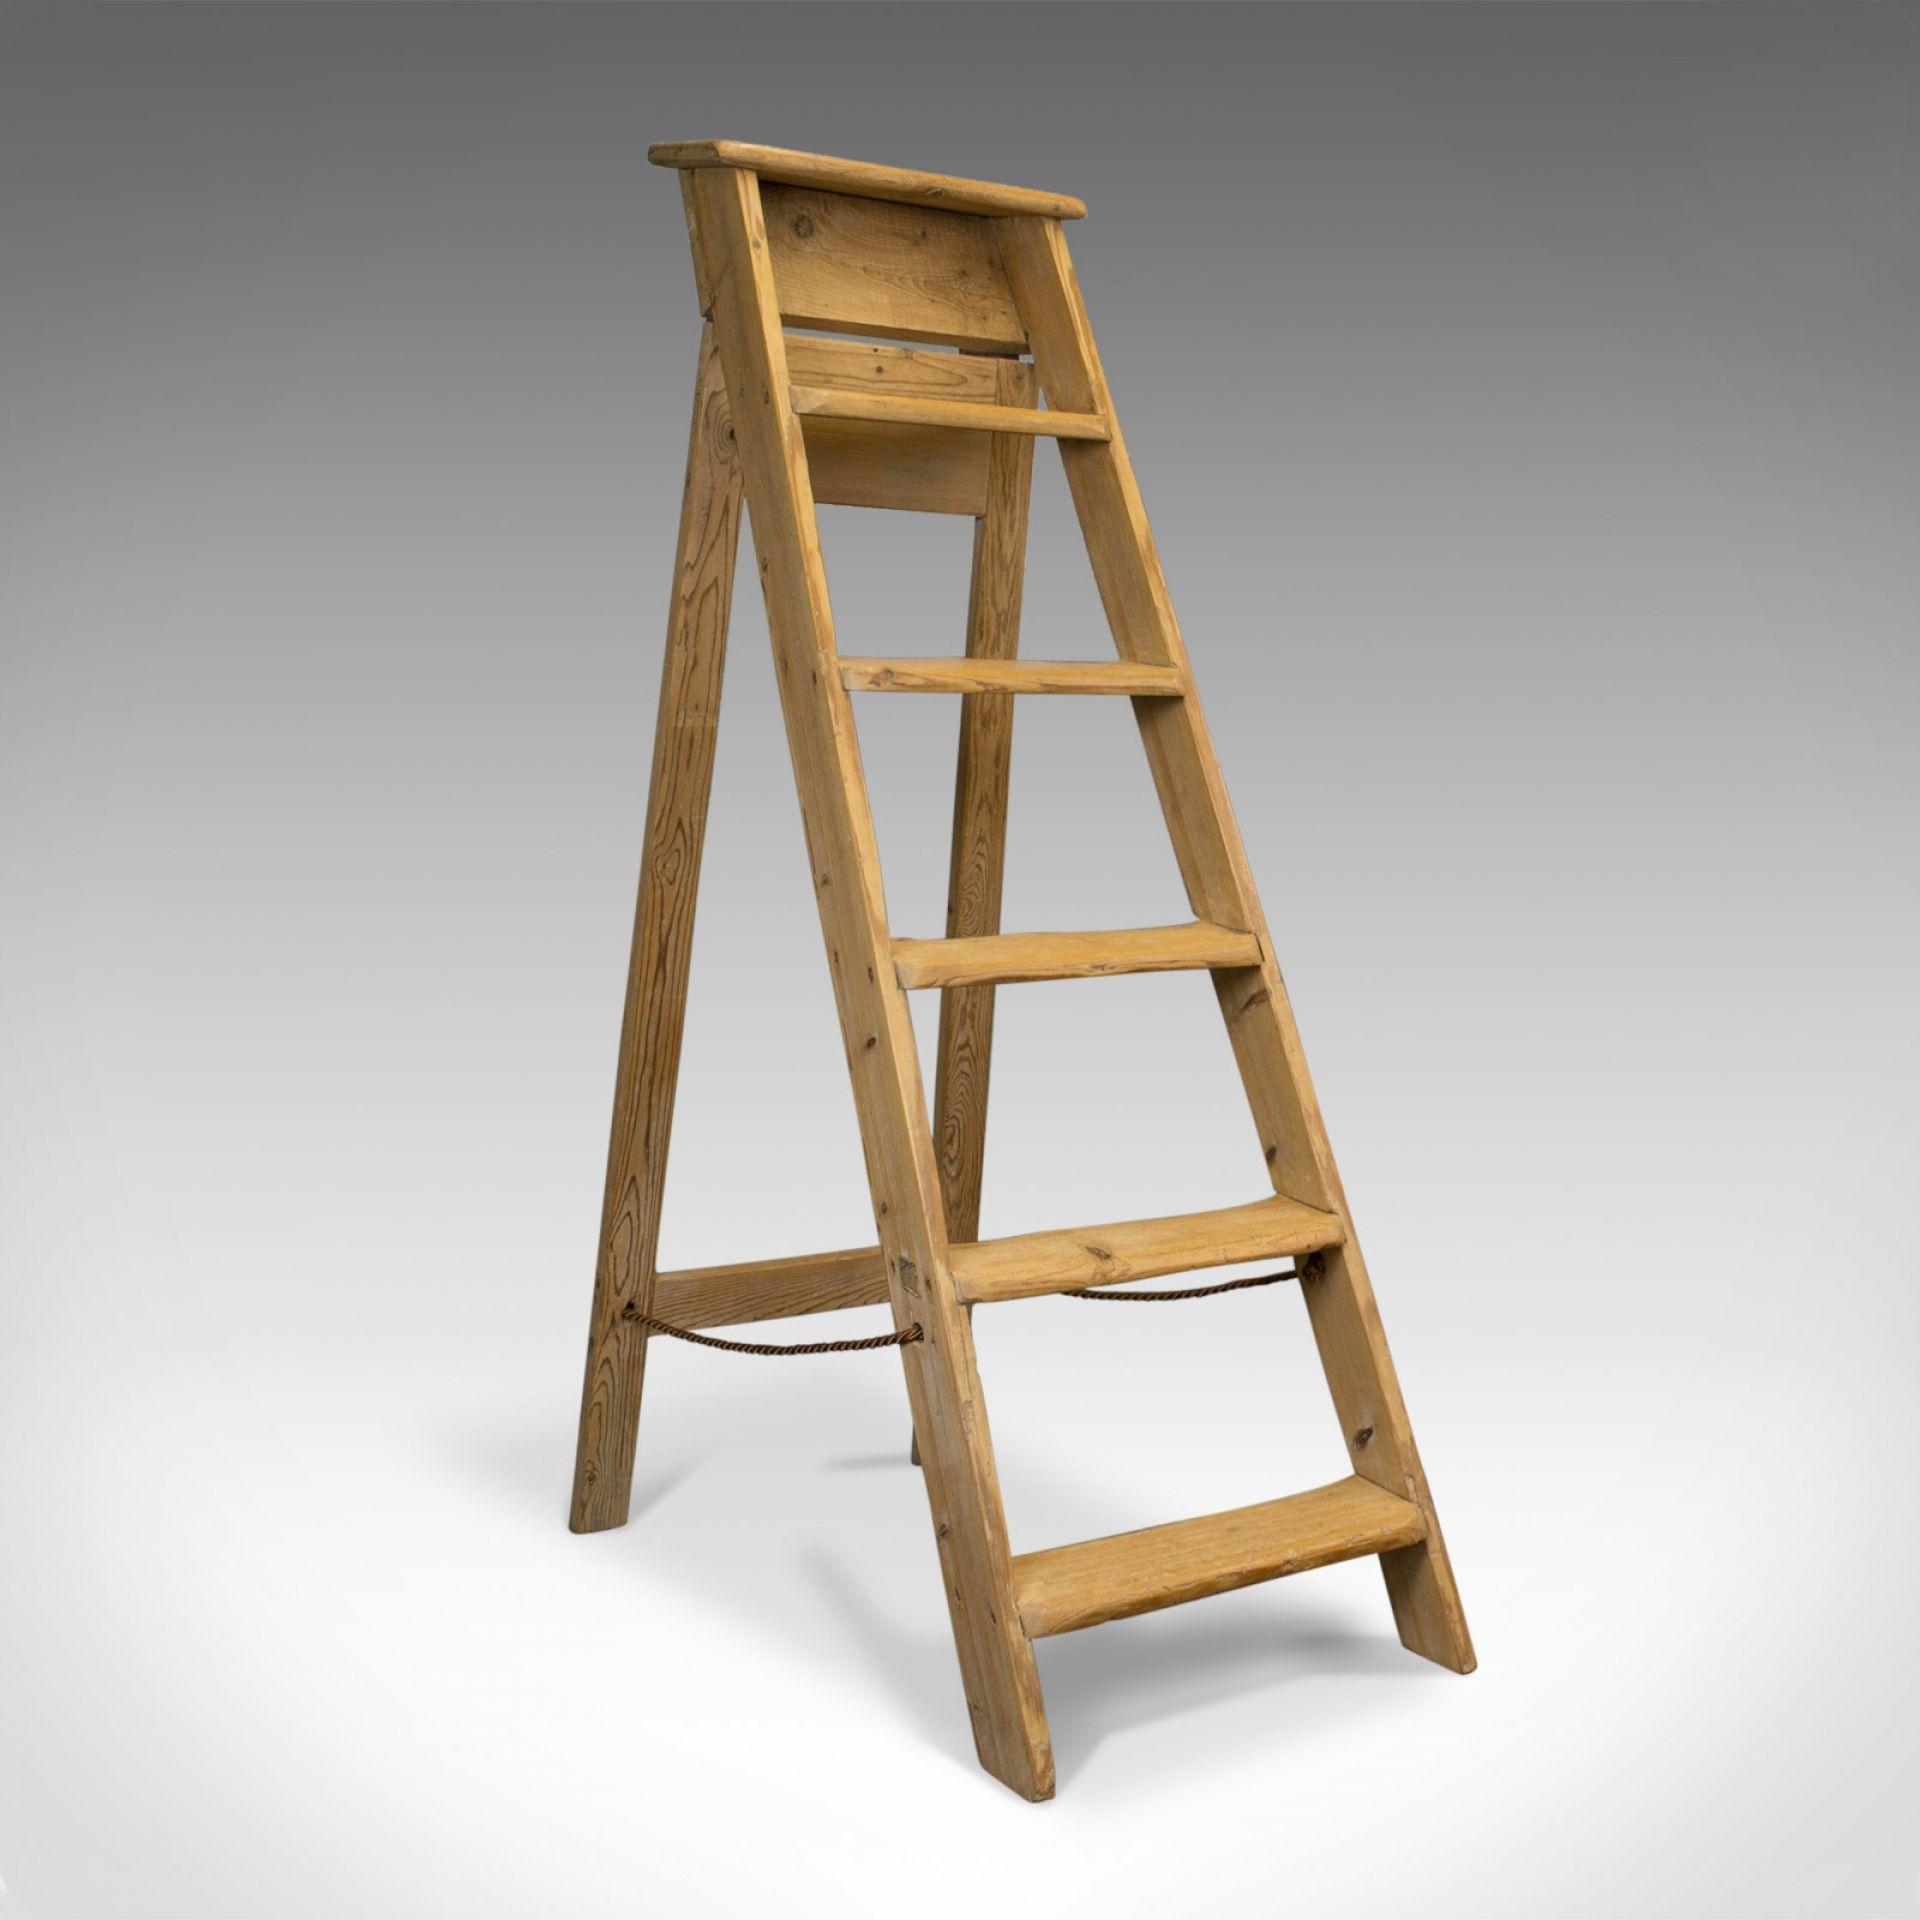 Antique Step Ladder, English, Victorian, Pine, Set of Steps, Display, Circa 1900